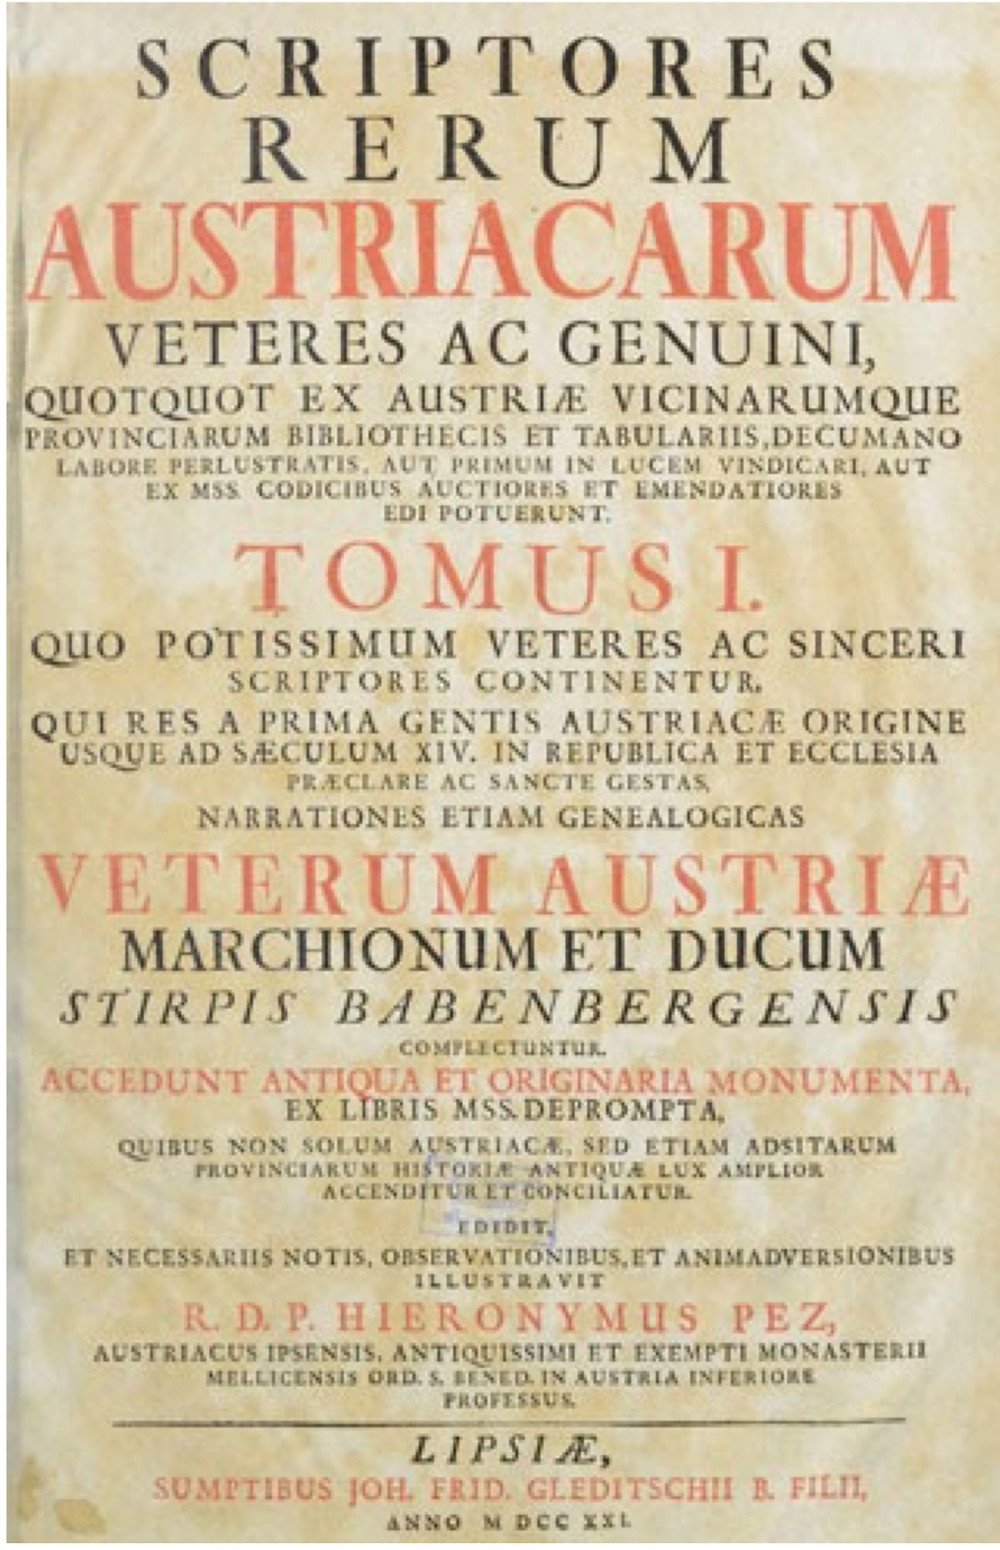 Fragment des Scriptores Renim Austriacanim de B. Pez.